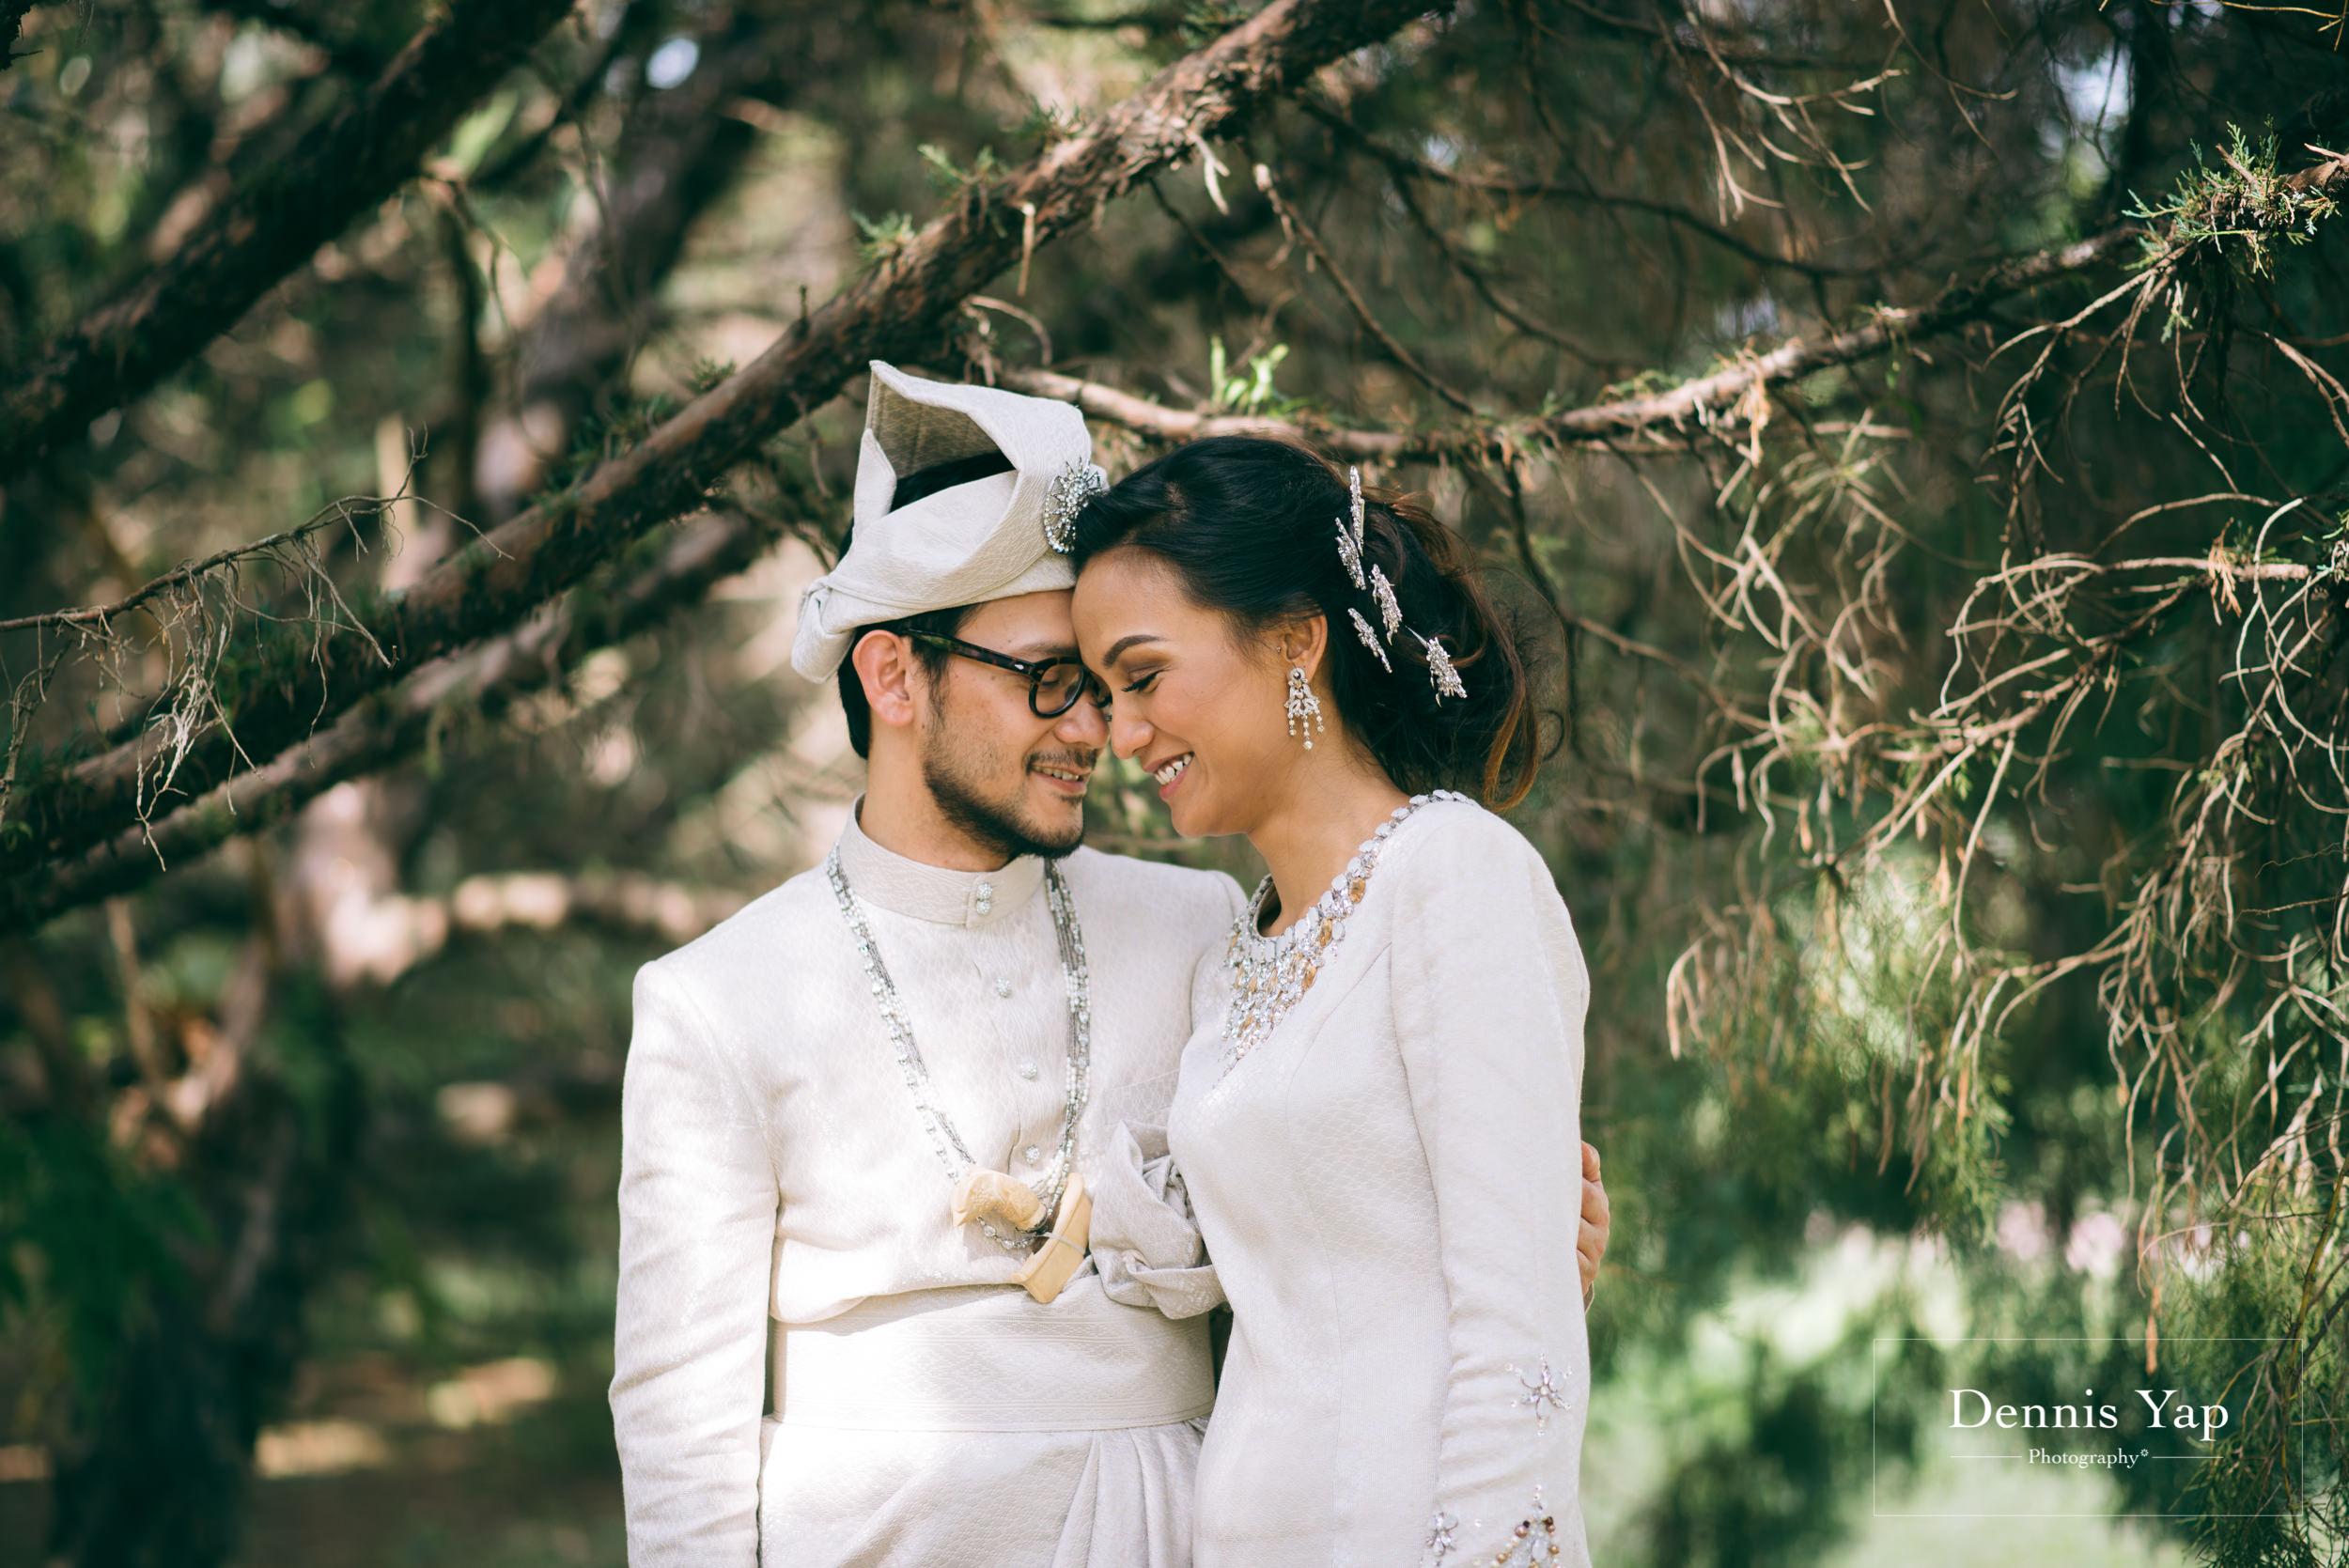 zarif hanalili malay wedding blessing ceremony dennis yap photography-27.jpg